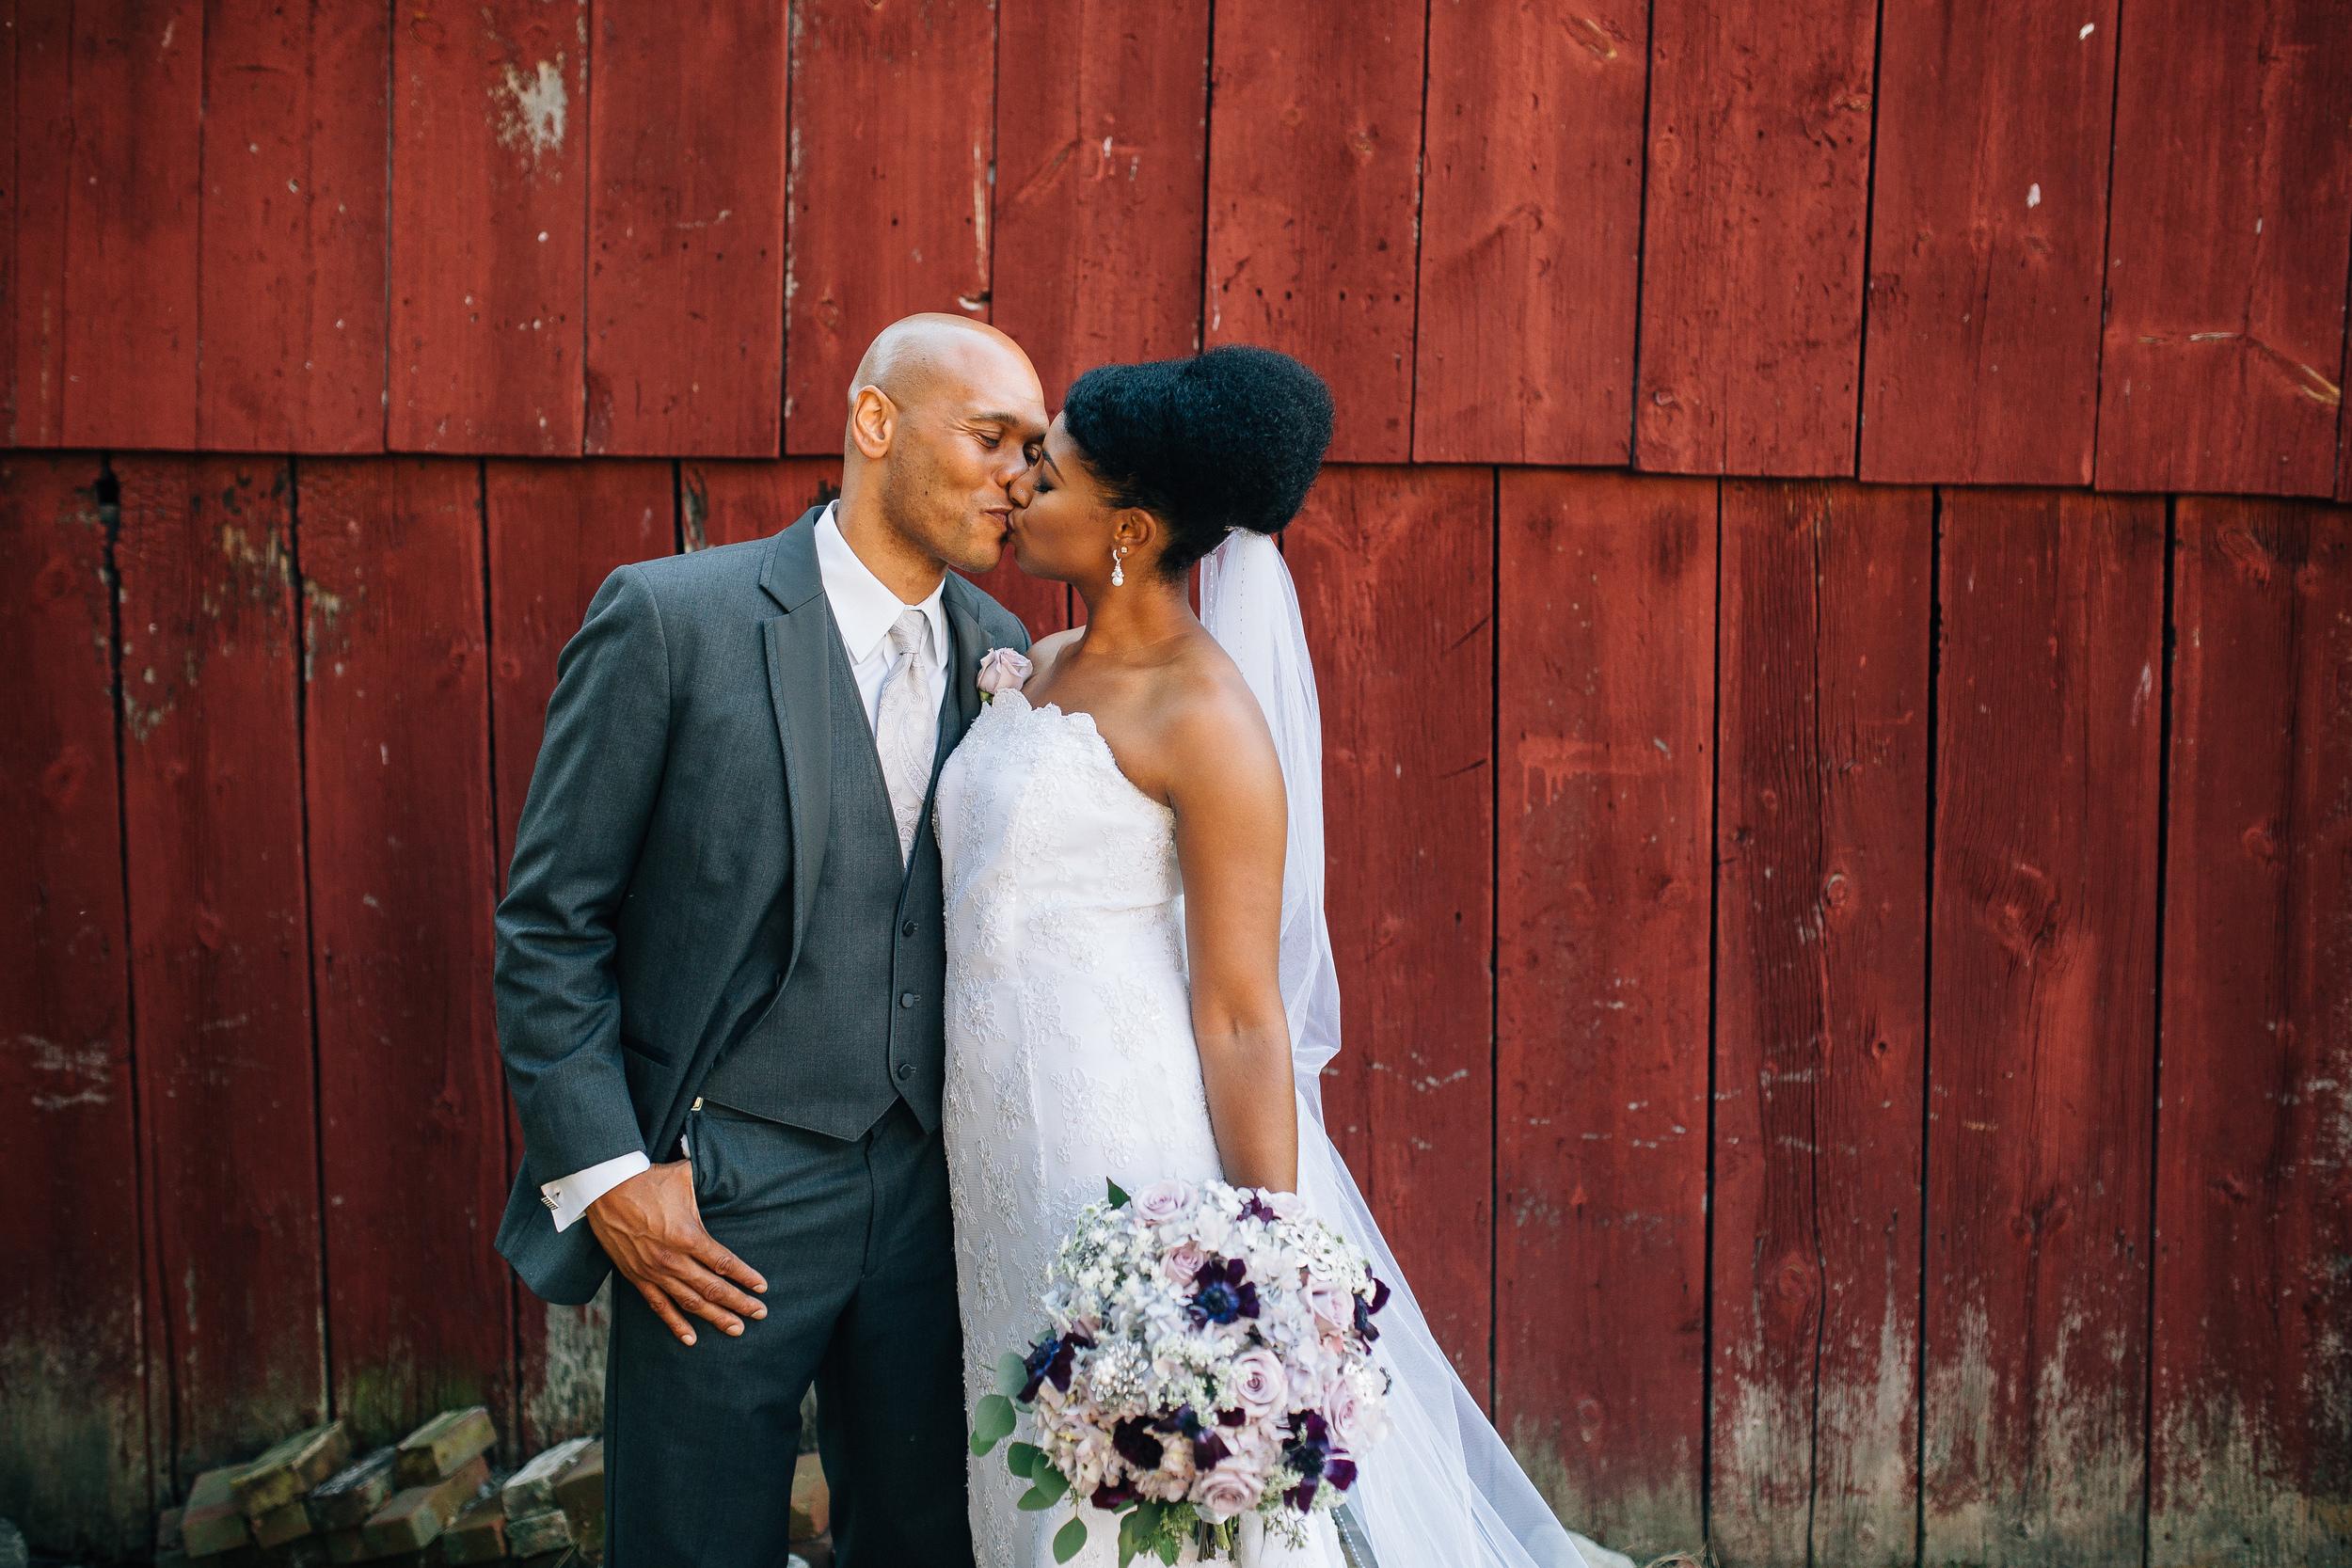 Chuck & Alicia's Wedding - Corrie Mick Photography-439.jpg